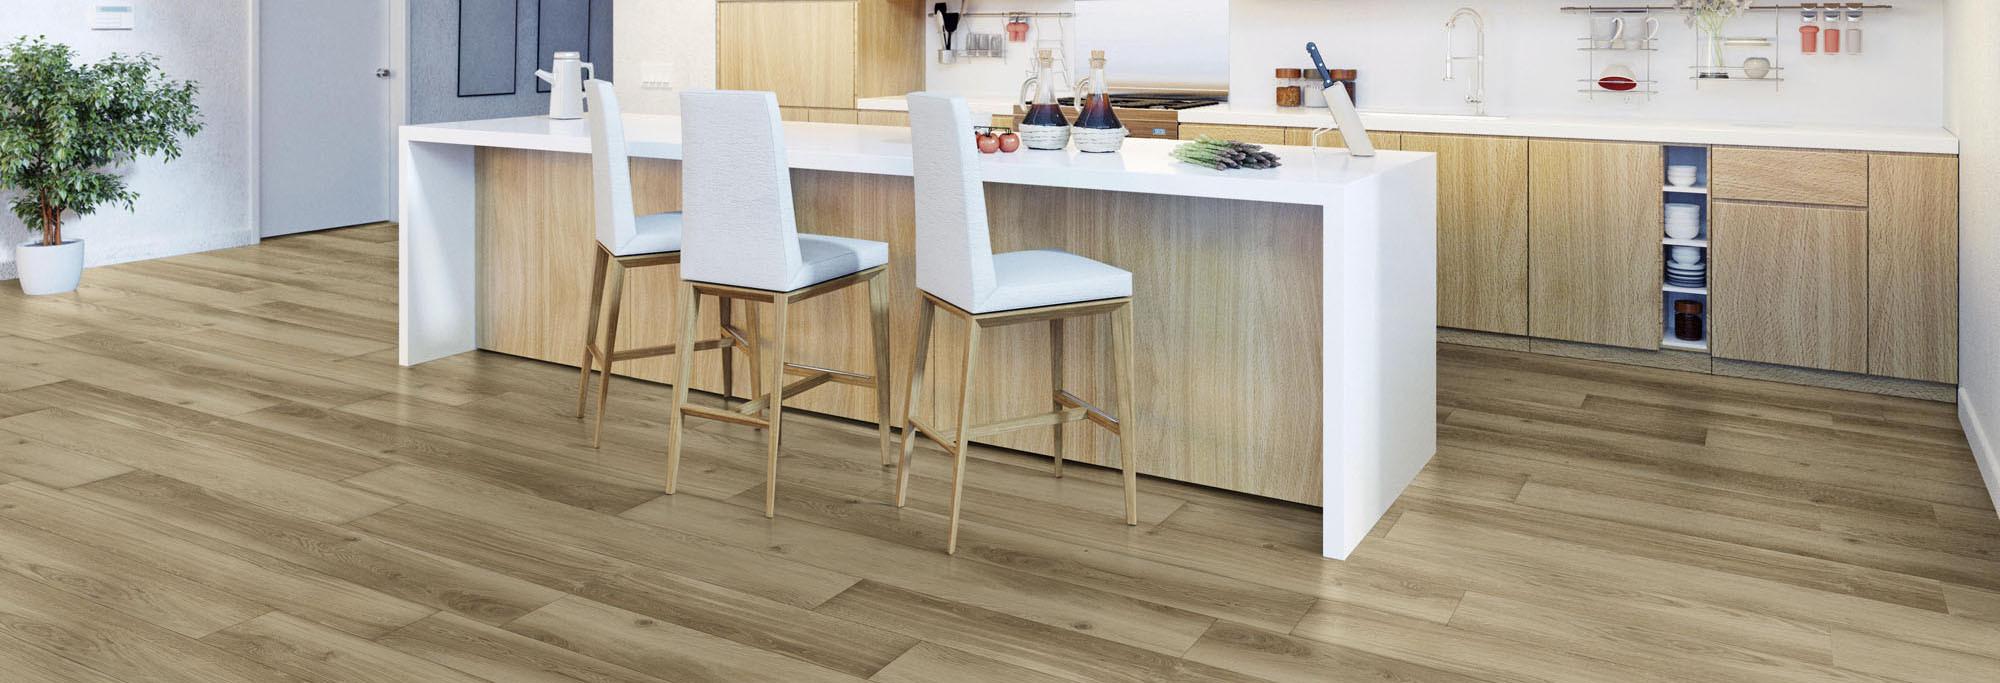 hardwood floor refinishing norwalk ct of metroflor luxury vinyl tile lvt flooring with regard to impressively durable style